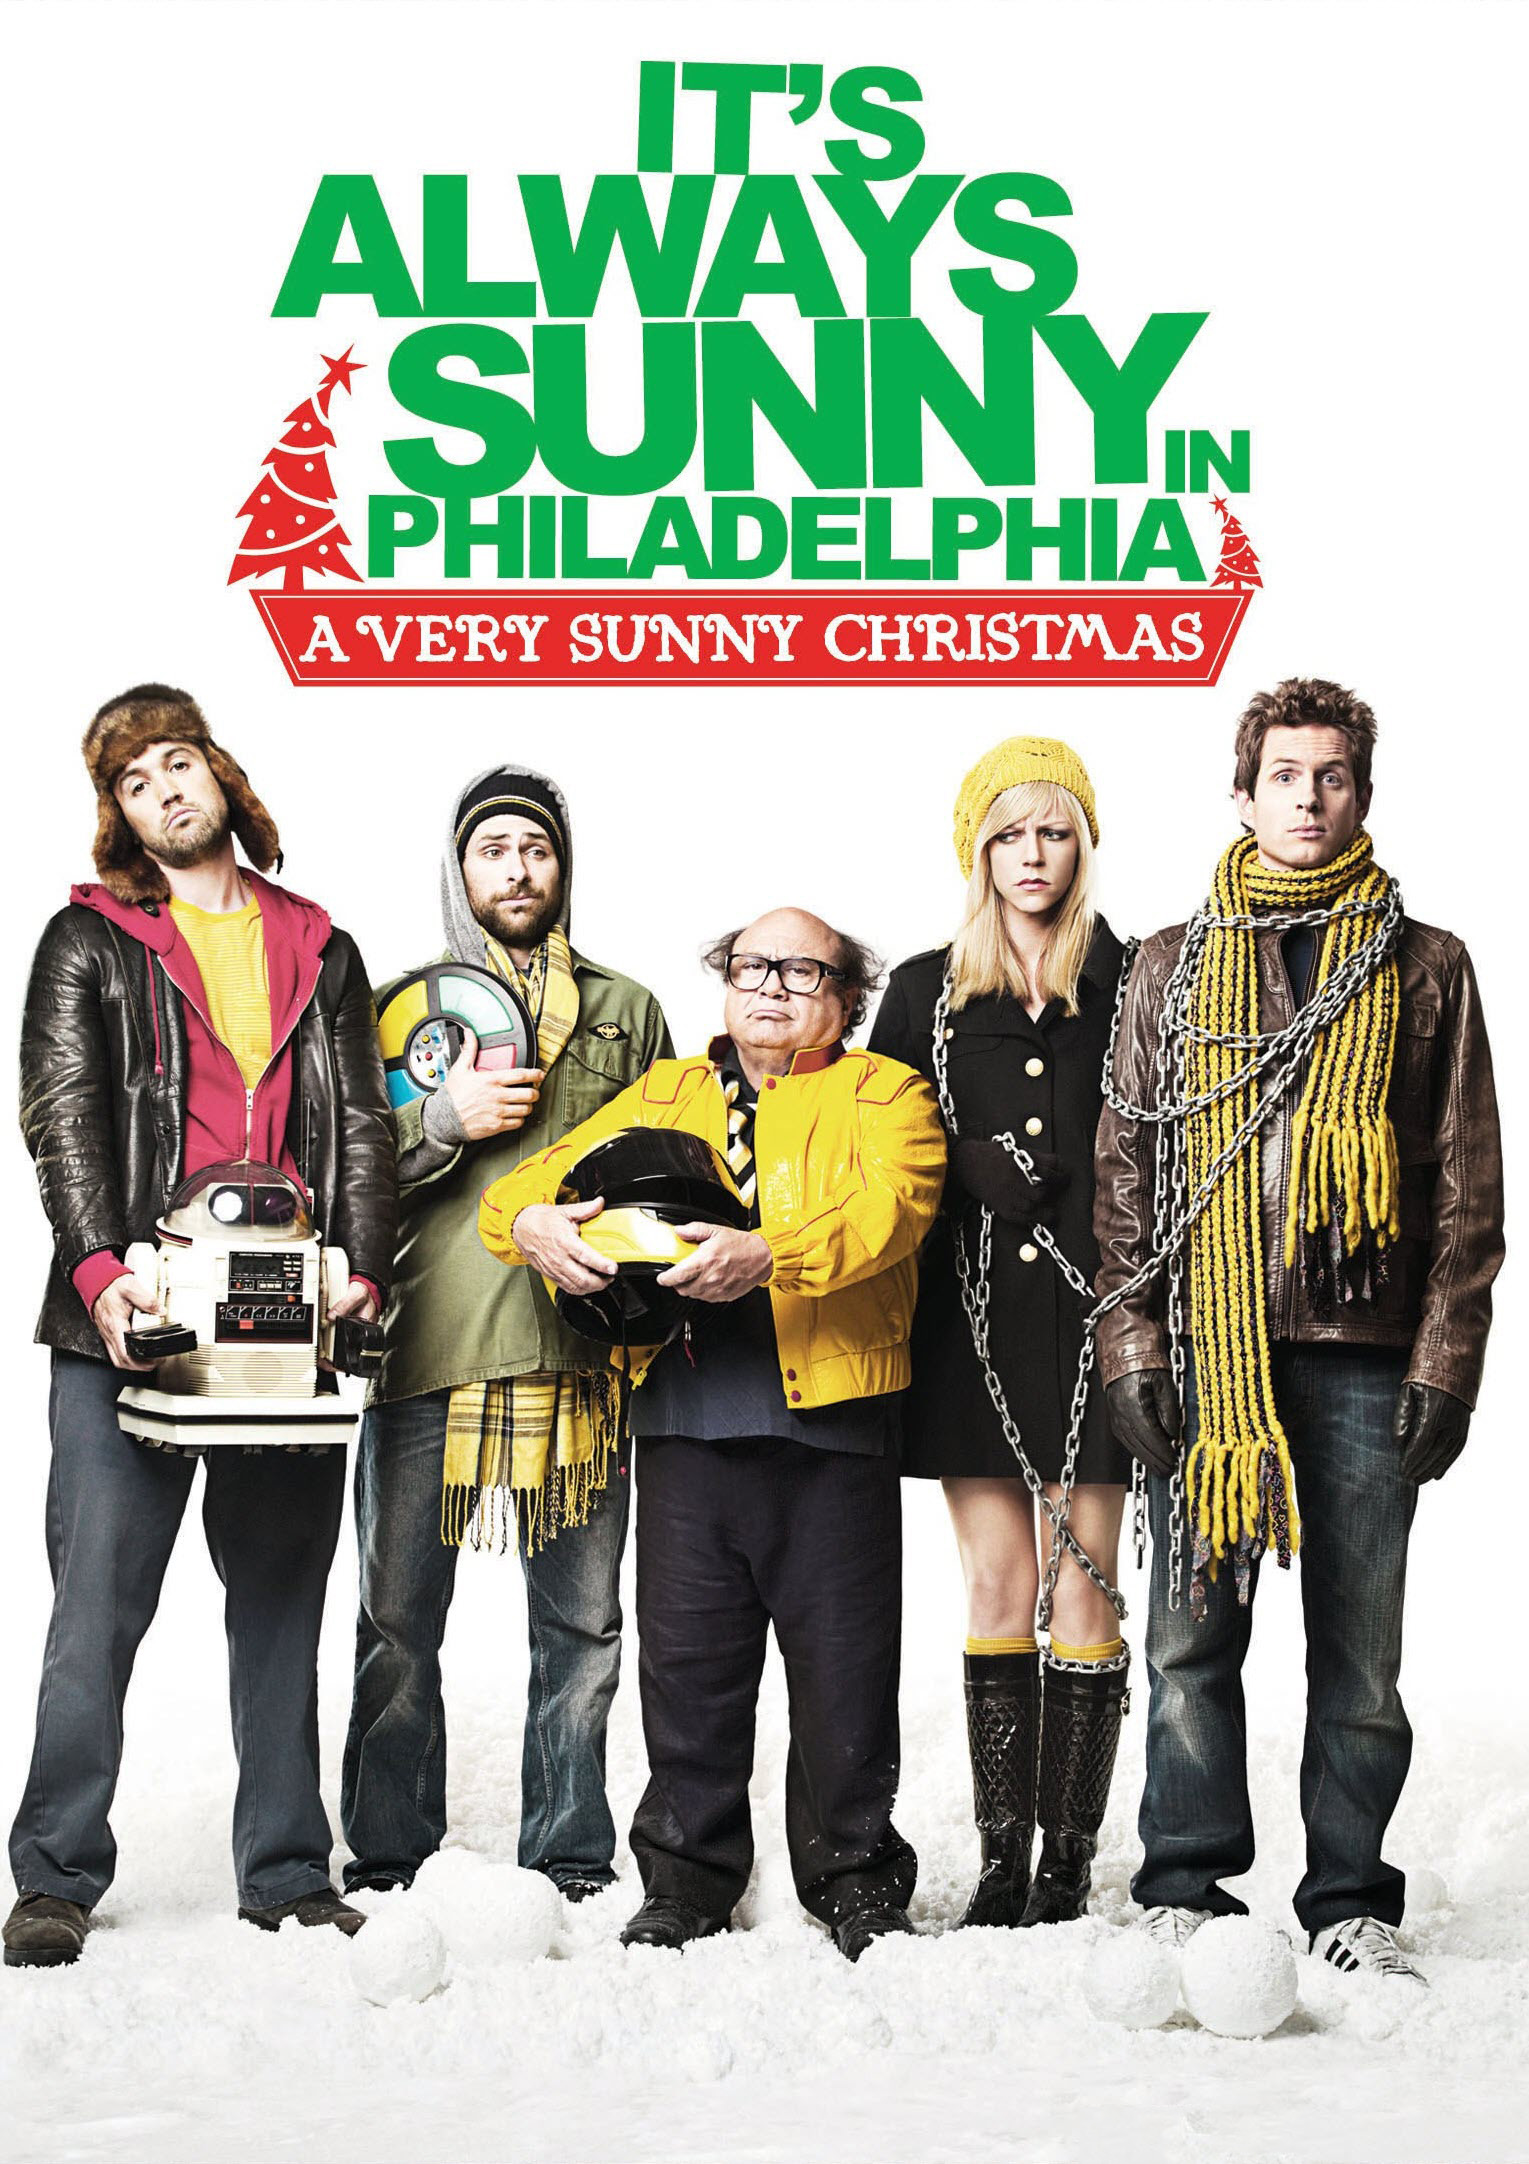 A Very Sunny Christmas DVD   It's Always Sunny in Philadelphia ...